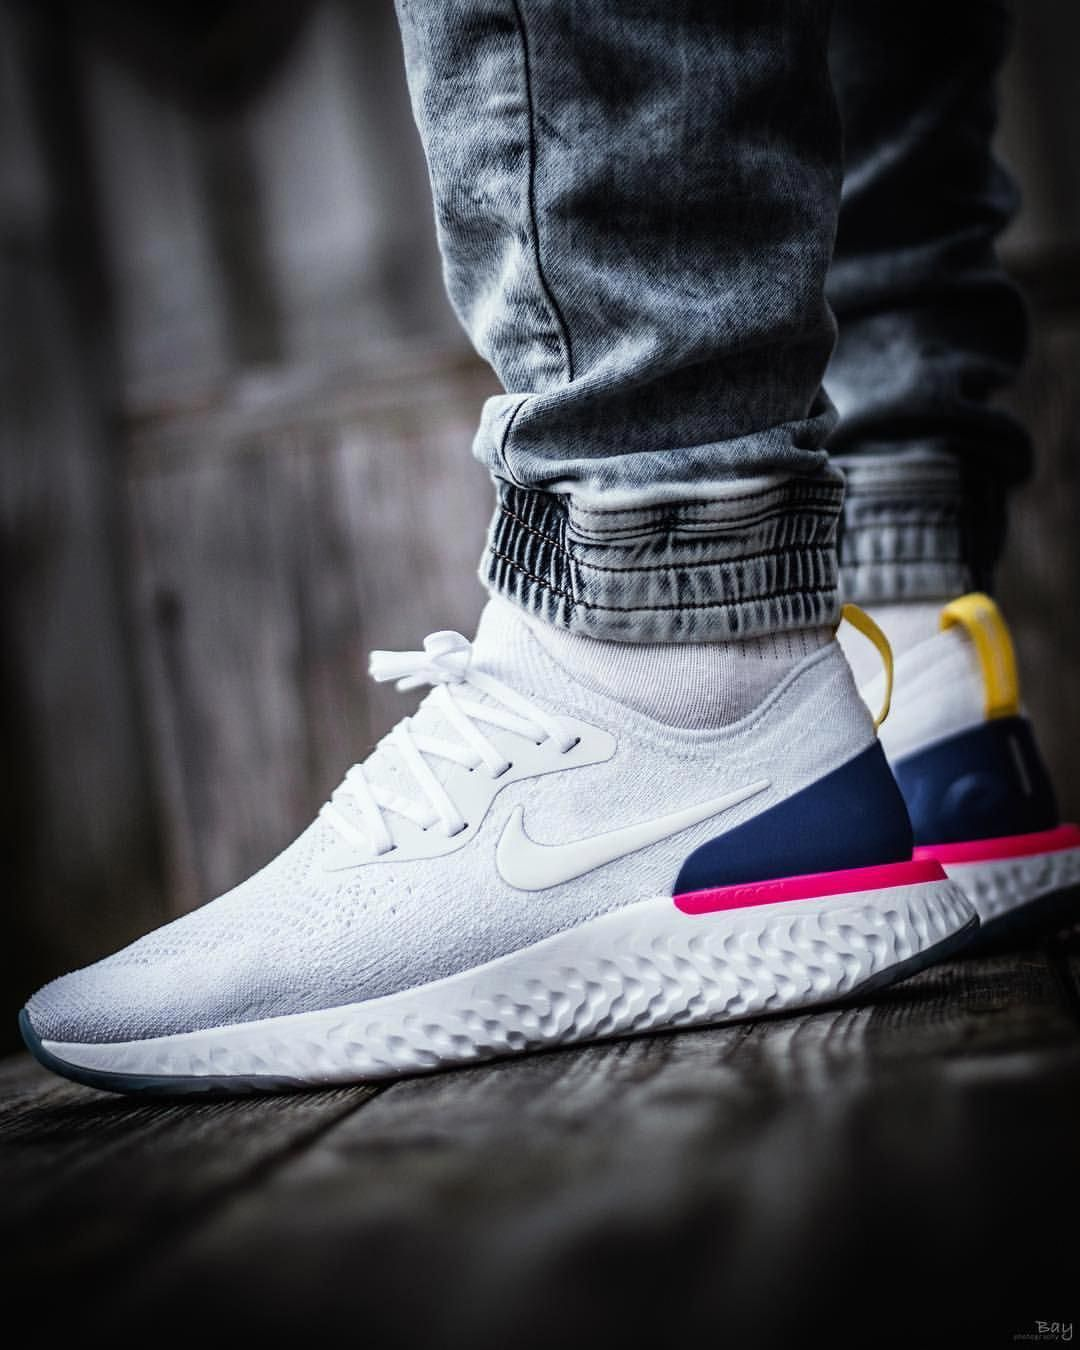 "291c0f12d4f1 EPiCREACT""  nike  nikesportswear  epicreact  nikeepicreact   epicreactflyknit  nikeepicreactflyknit  1daily  getswooshed   sneakerplaats…  Sneakers"